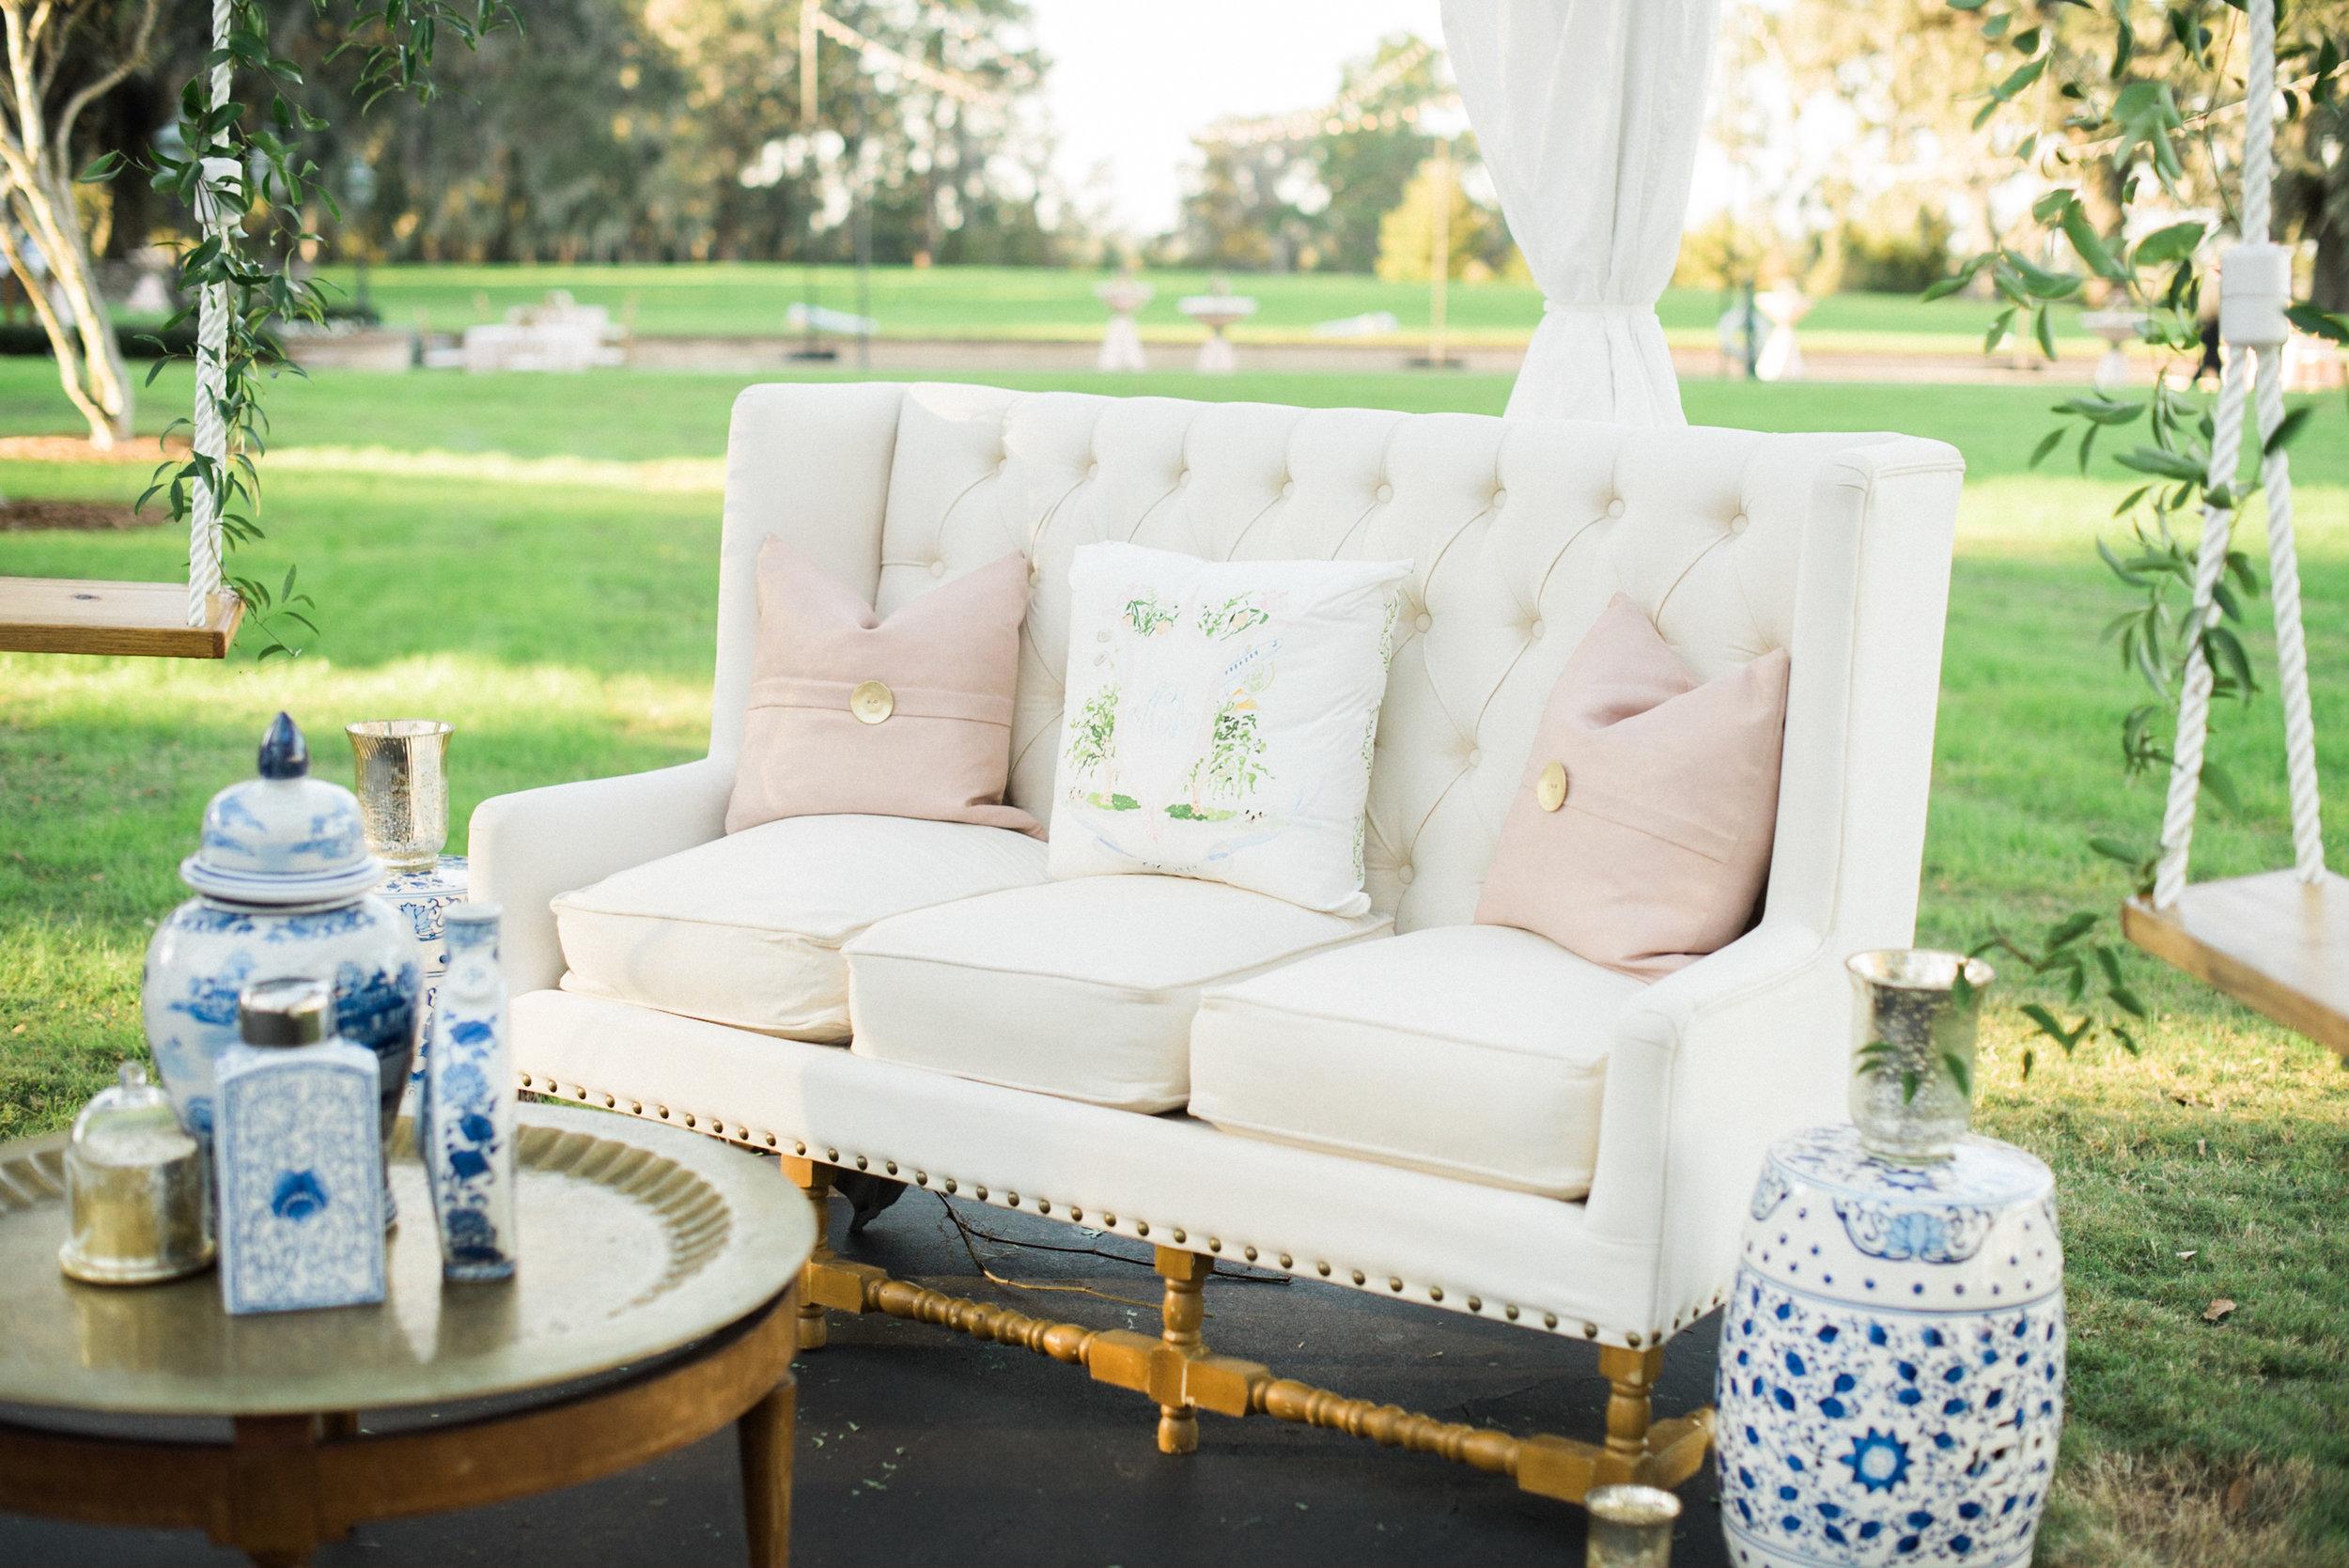 Custom Watercolor Wedding Crest Pillow by Simply Jessica Marie | Wedding Lounge Area | Savannah Wedding | Vitor Lindo Photography